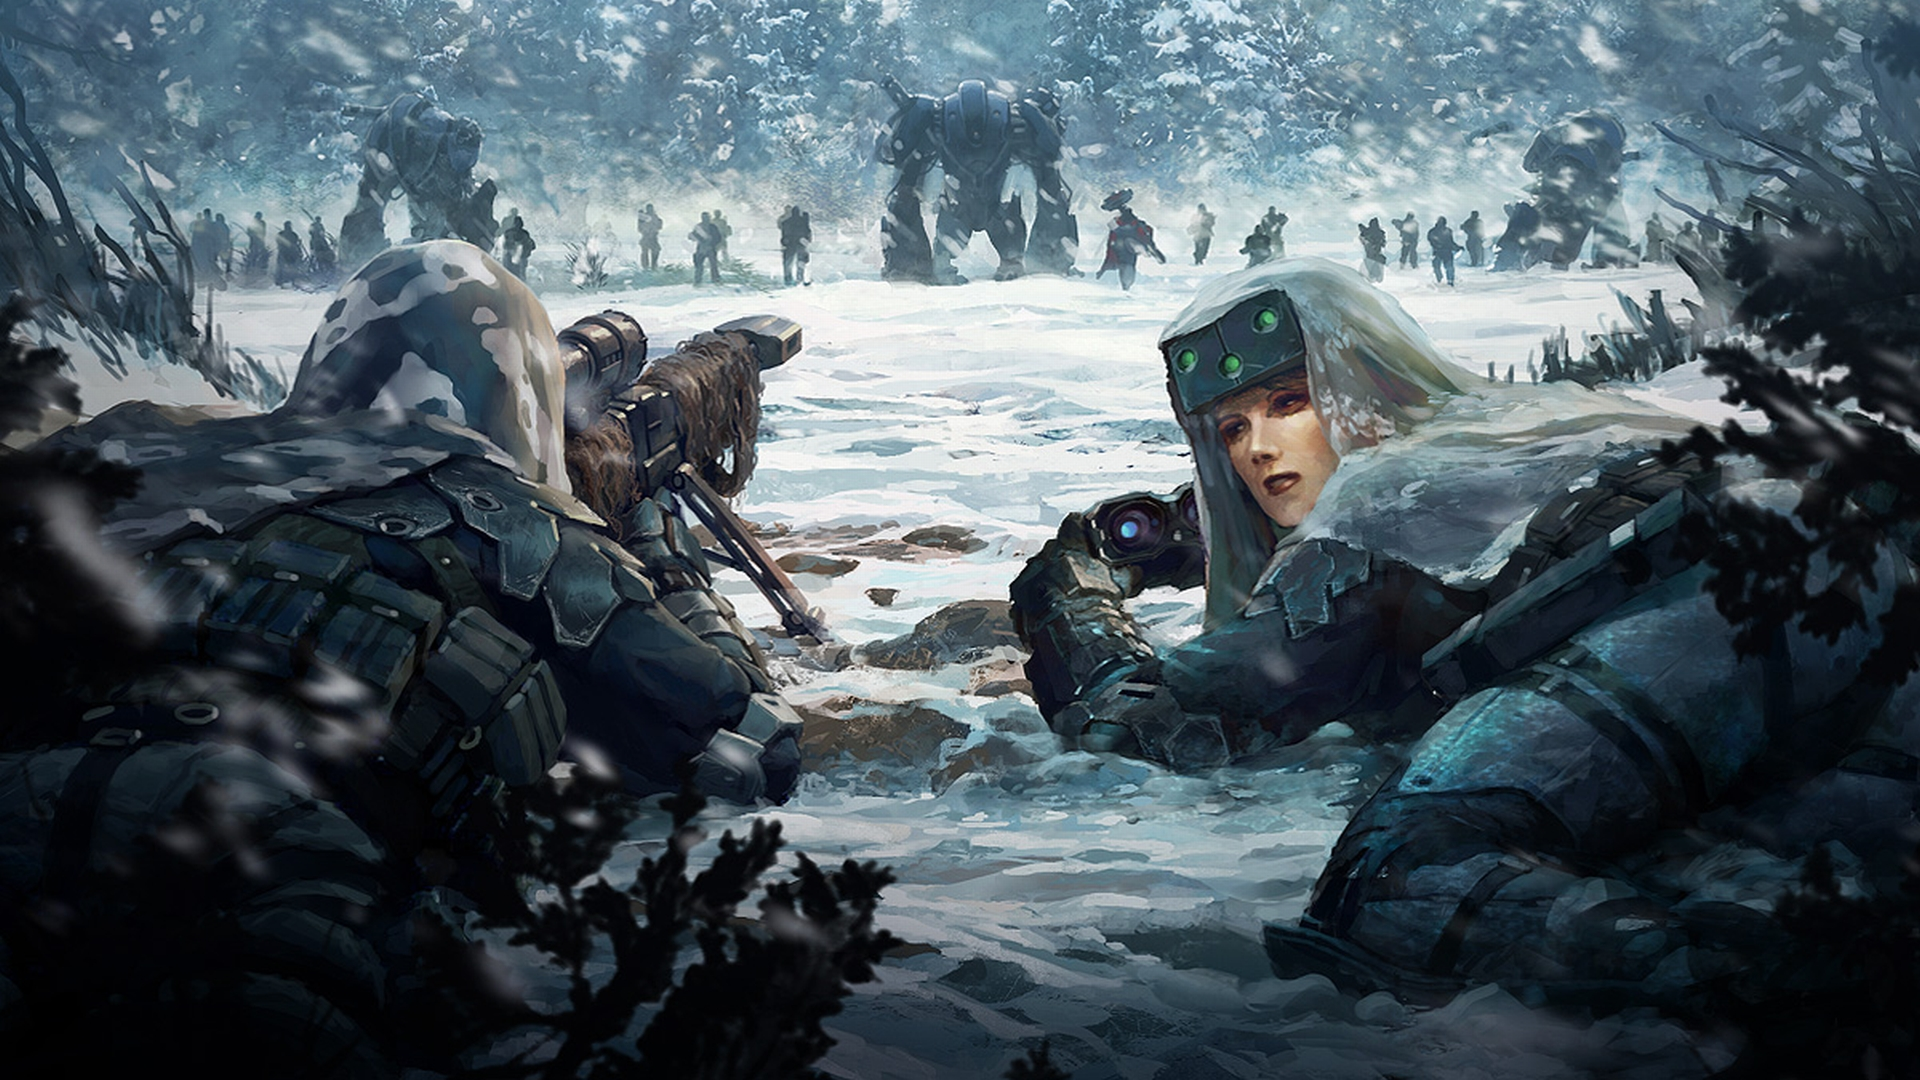 Science Fiction Battle wallpaper   1246125 1920x1080